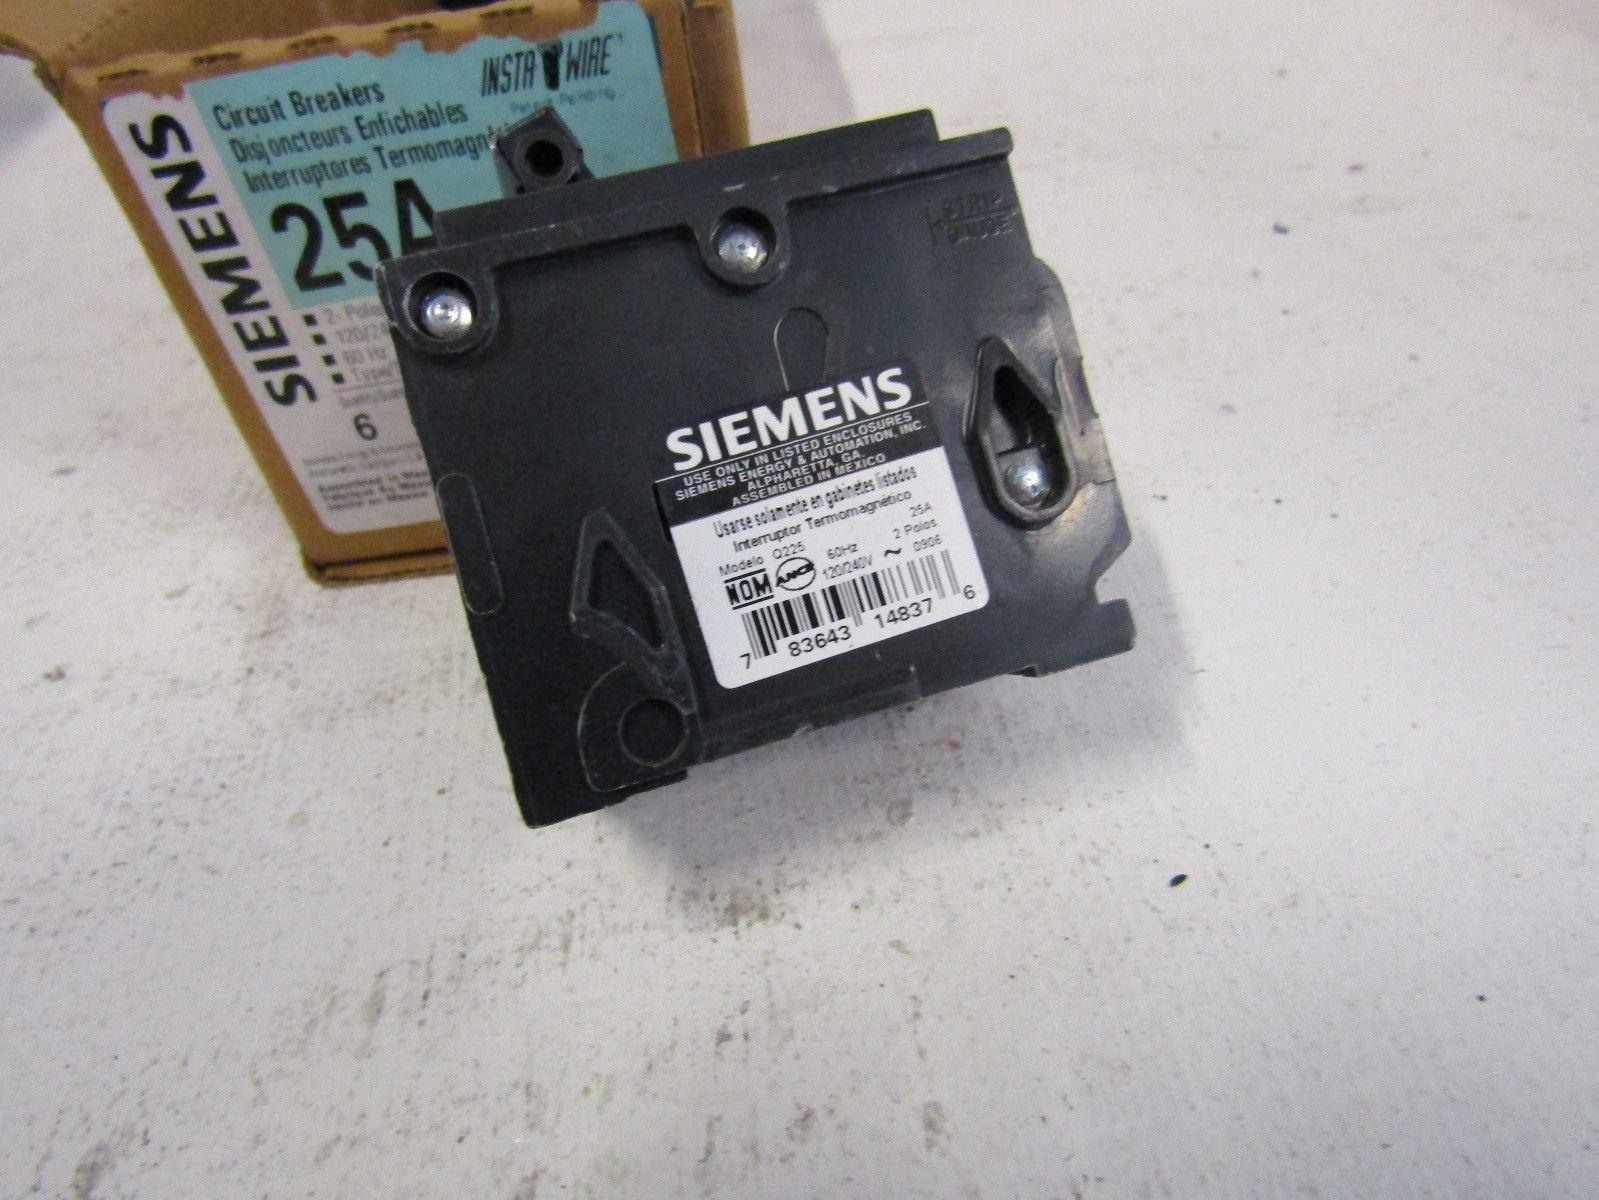 New Lot Of 3 Siemens Q225 2 Pole 25 Amp 120 240v Plug In Circuit 25a Generator Breaker 10 Ebay